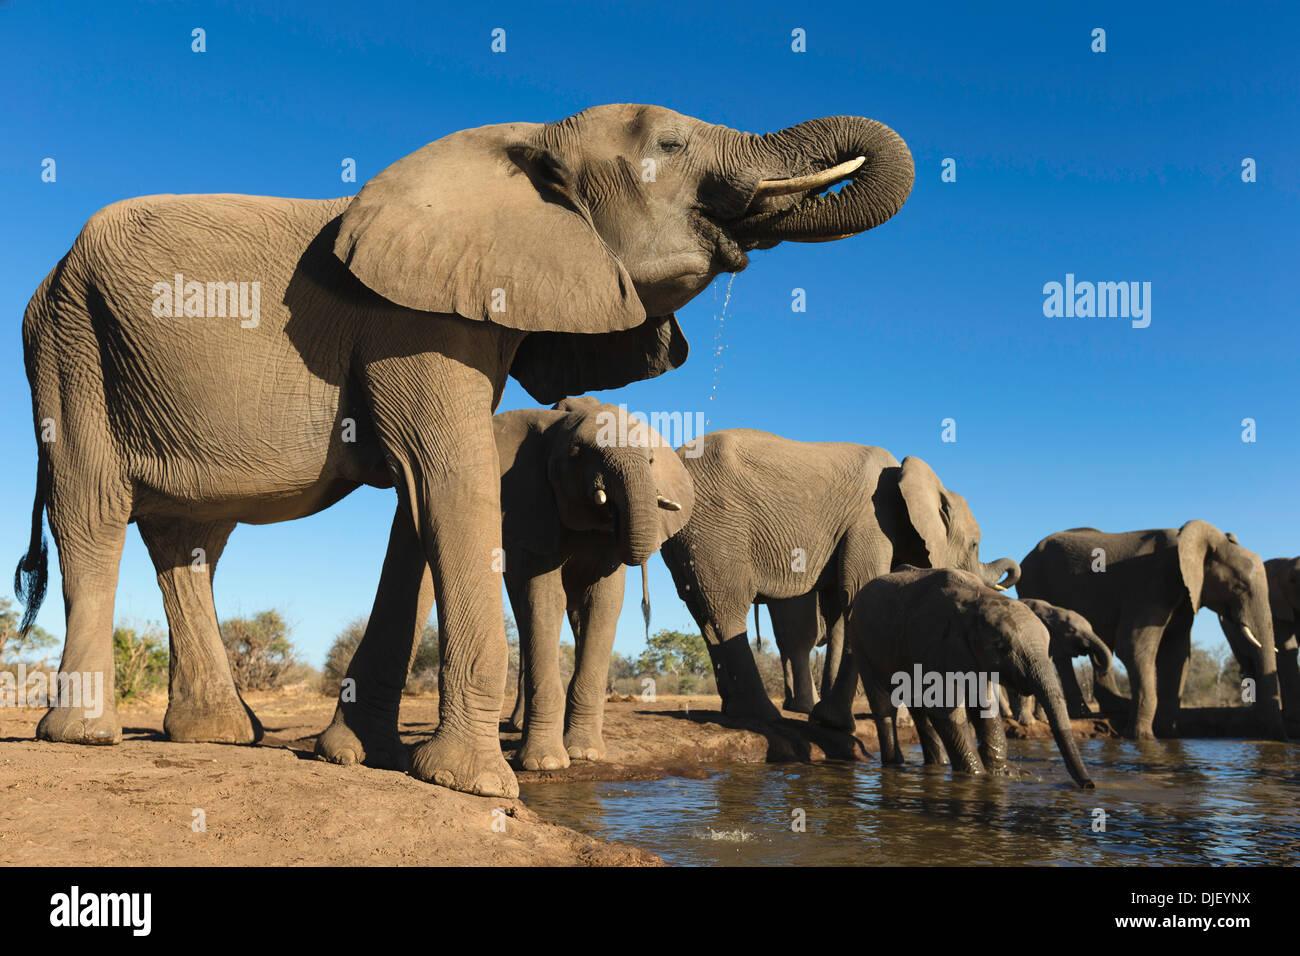 L'éléphant africain (Loxodonta africana) petit groupe d'éléphants de l'alcool à un étang à mashatu.Botswana Photo Stock